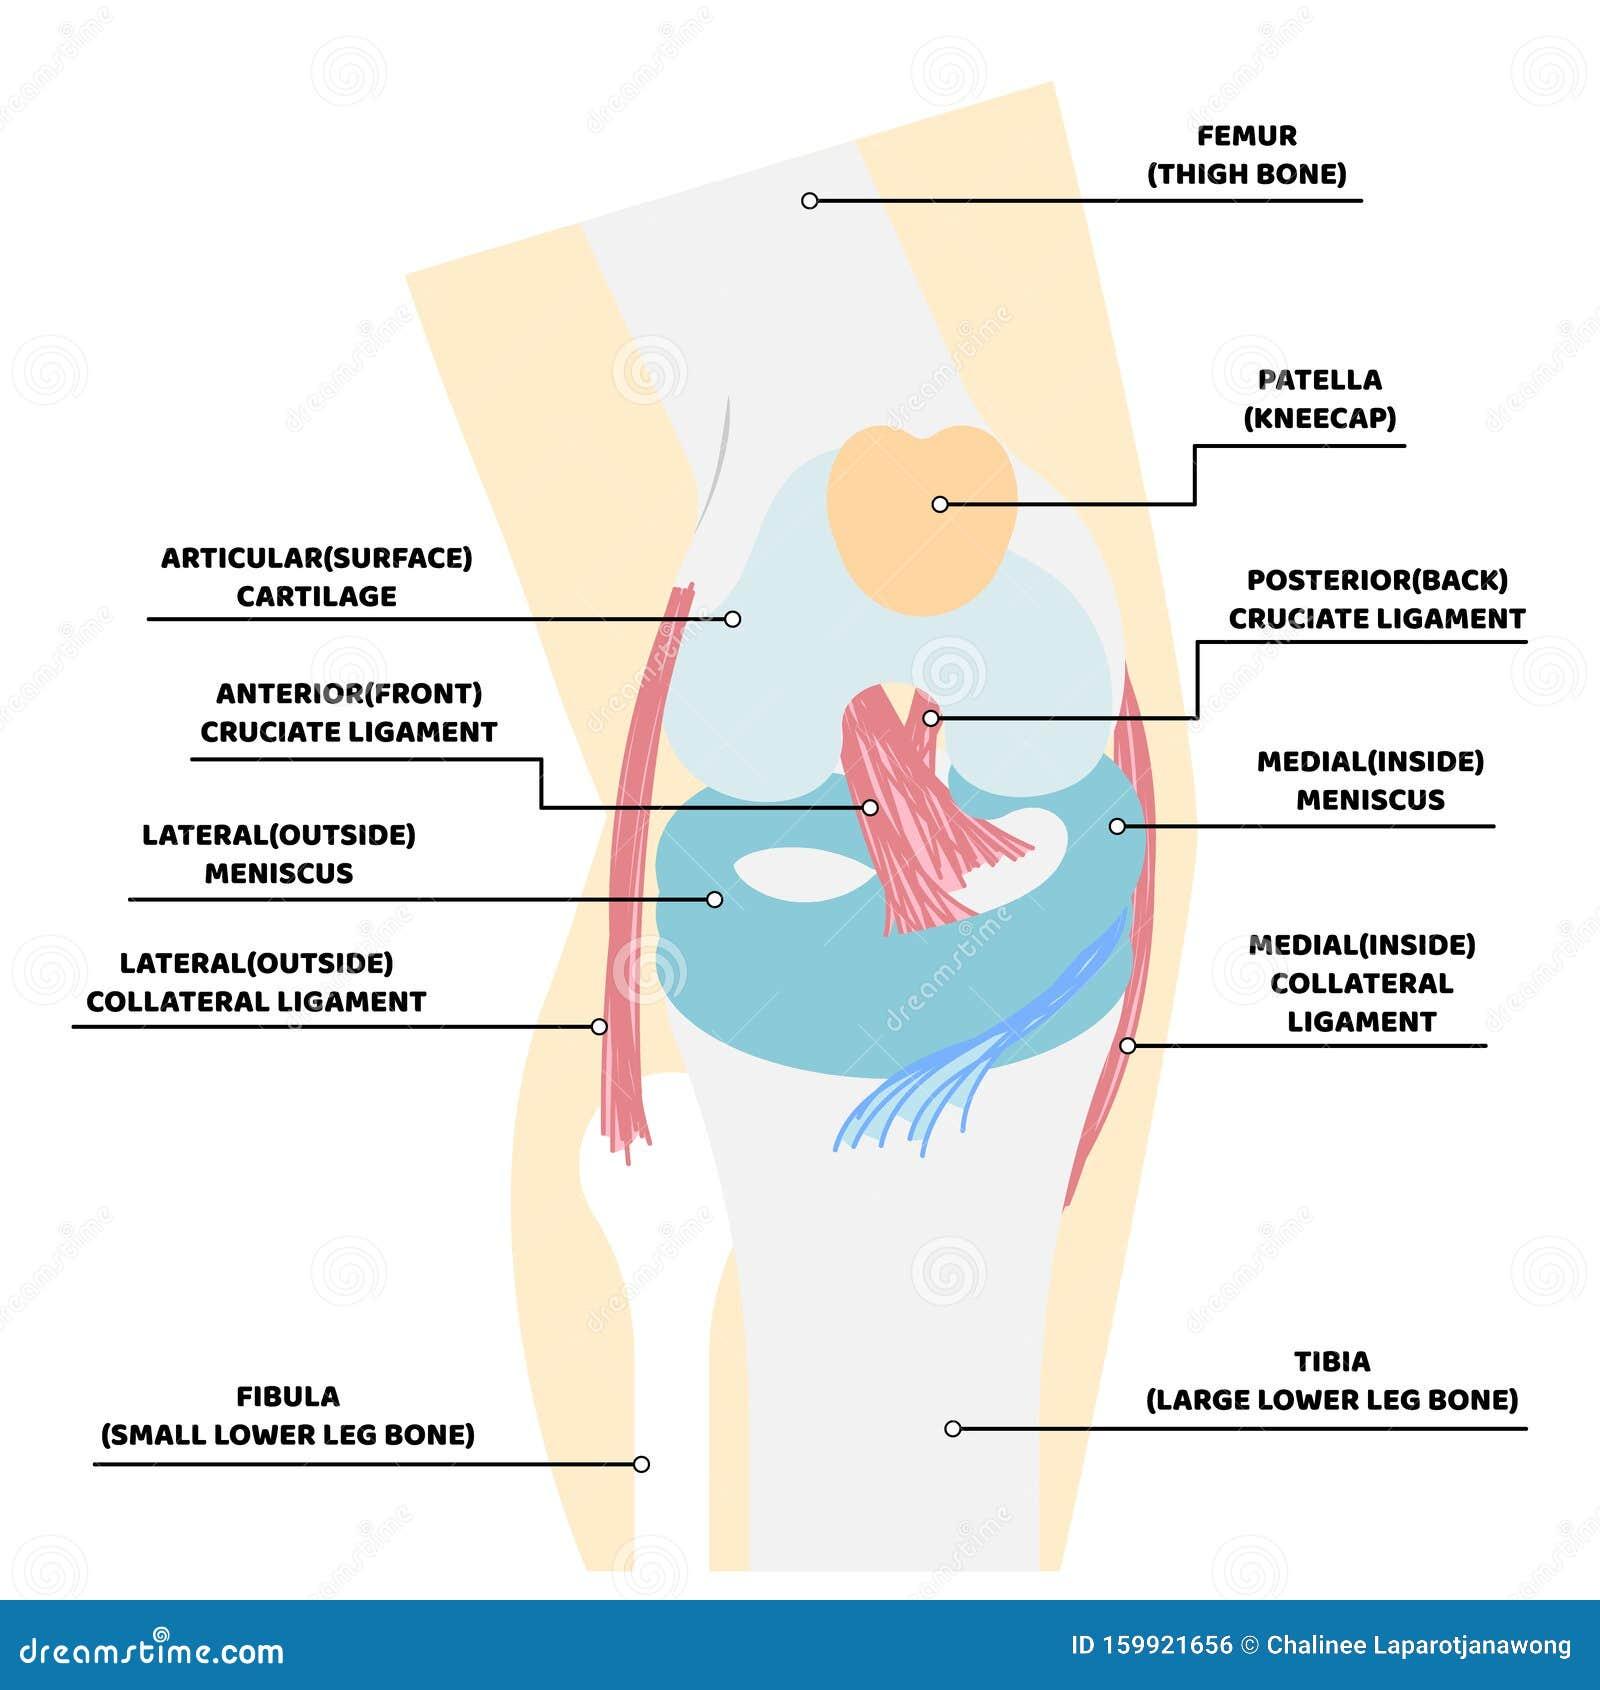 Durerile articulare: cauze, diagnostic, tratament, Tratament articular balacal